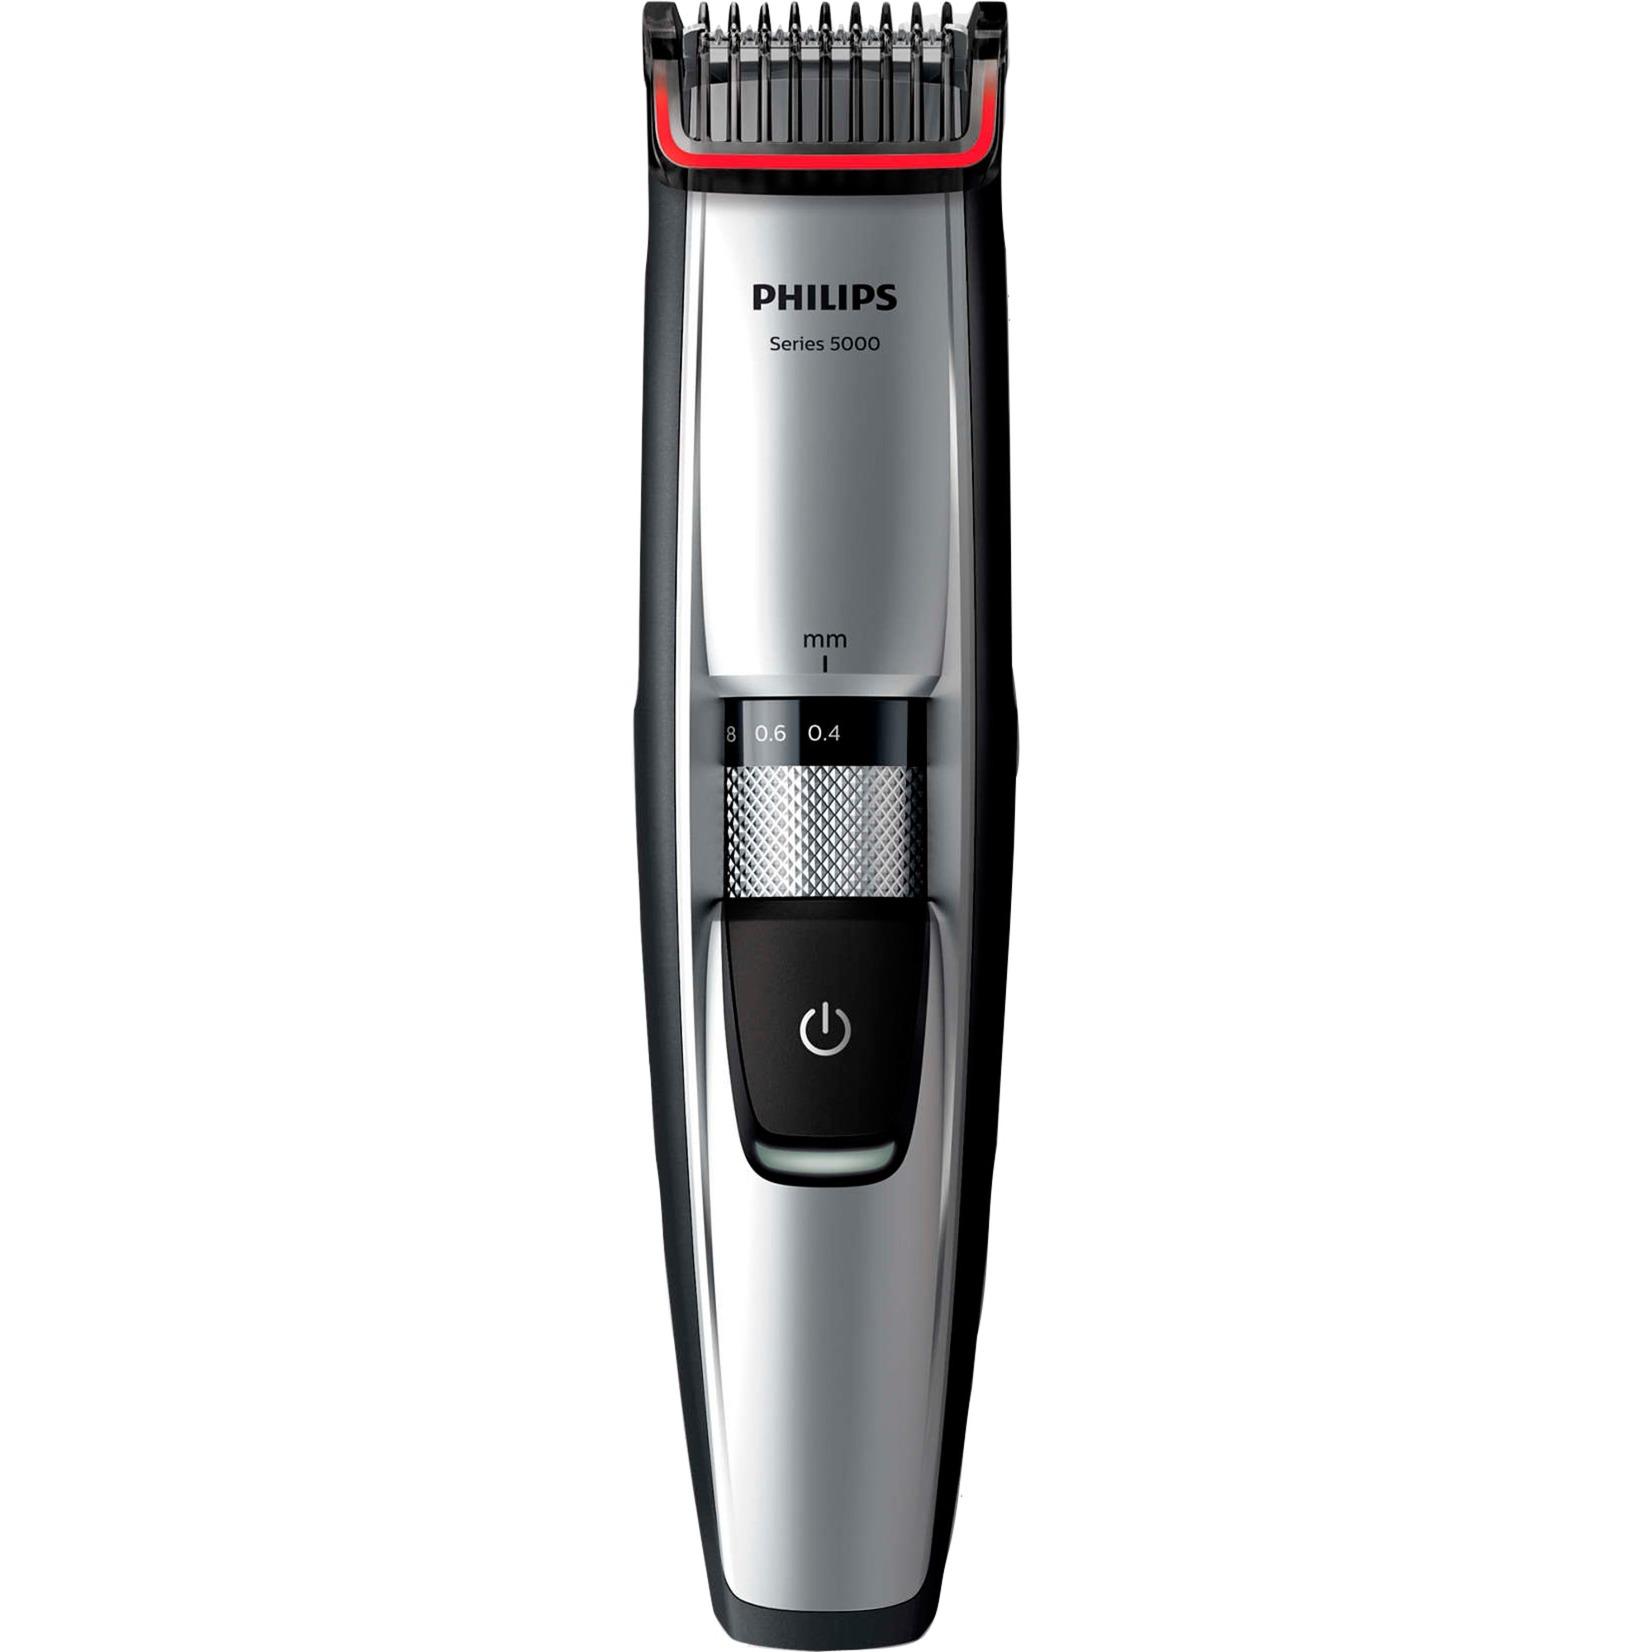 BEARDTRIMMER Series 5000 BT5205/16 Cromo depiladora para la barba, Cortapelo para barba